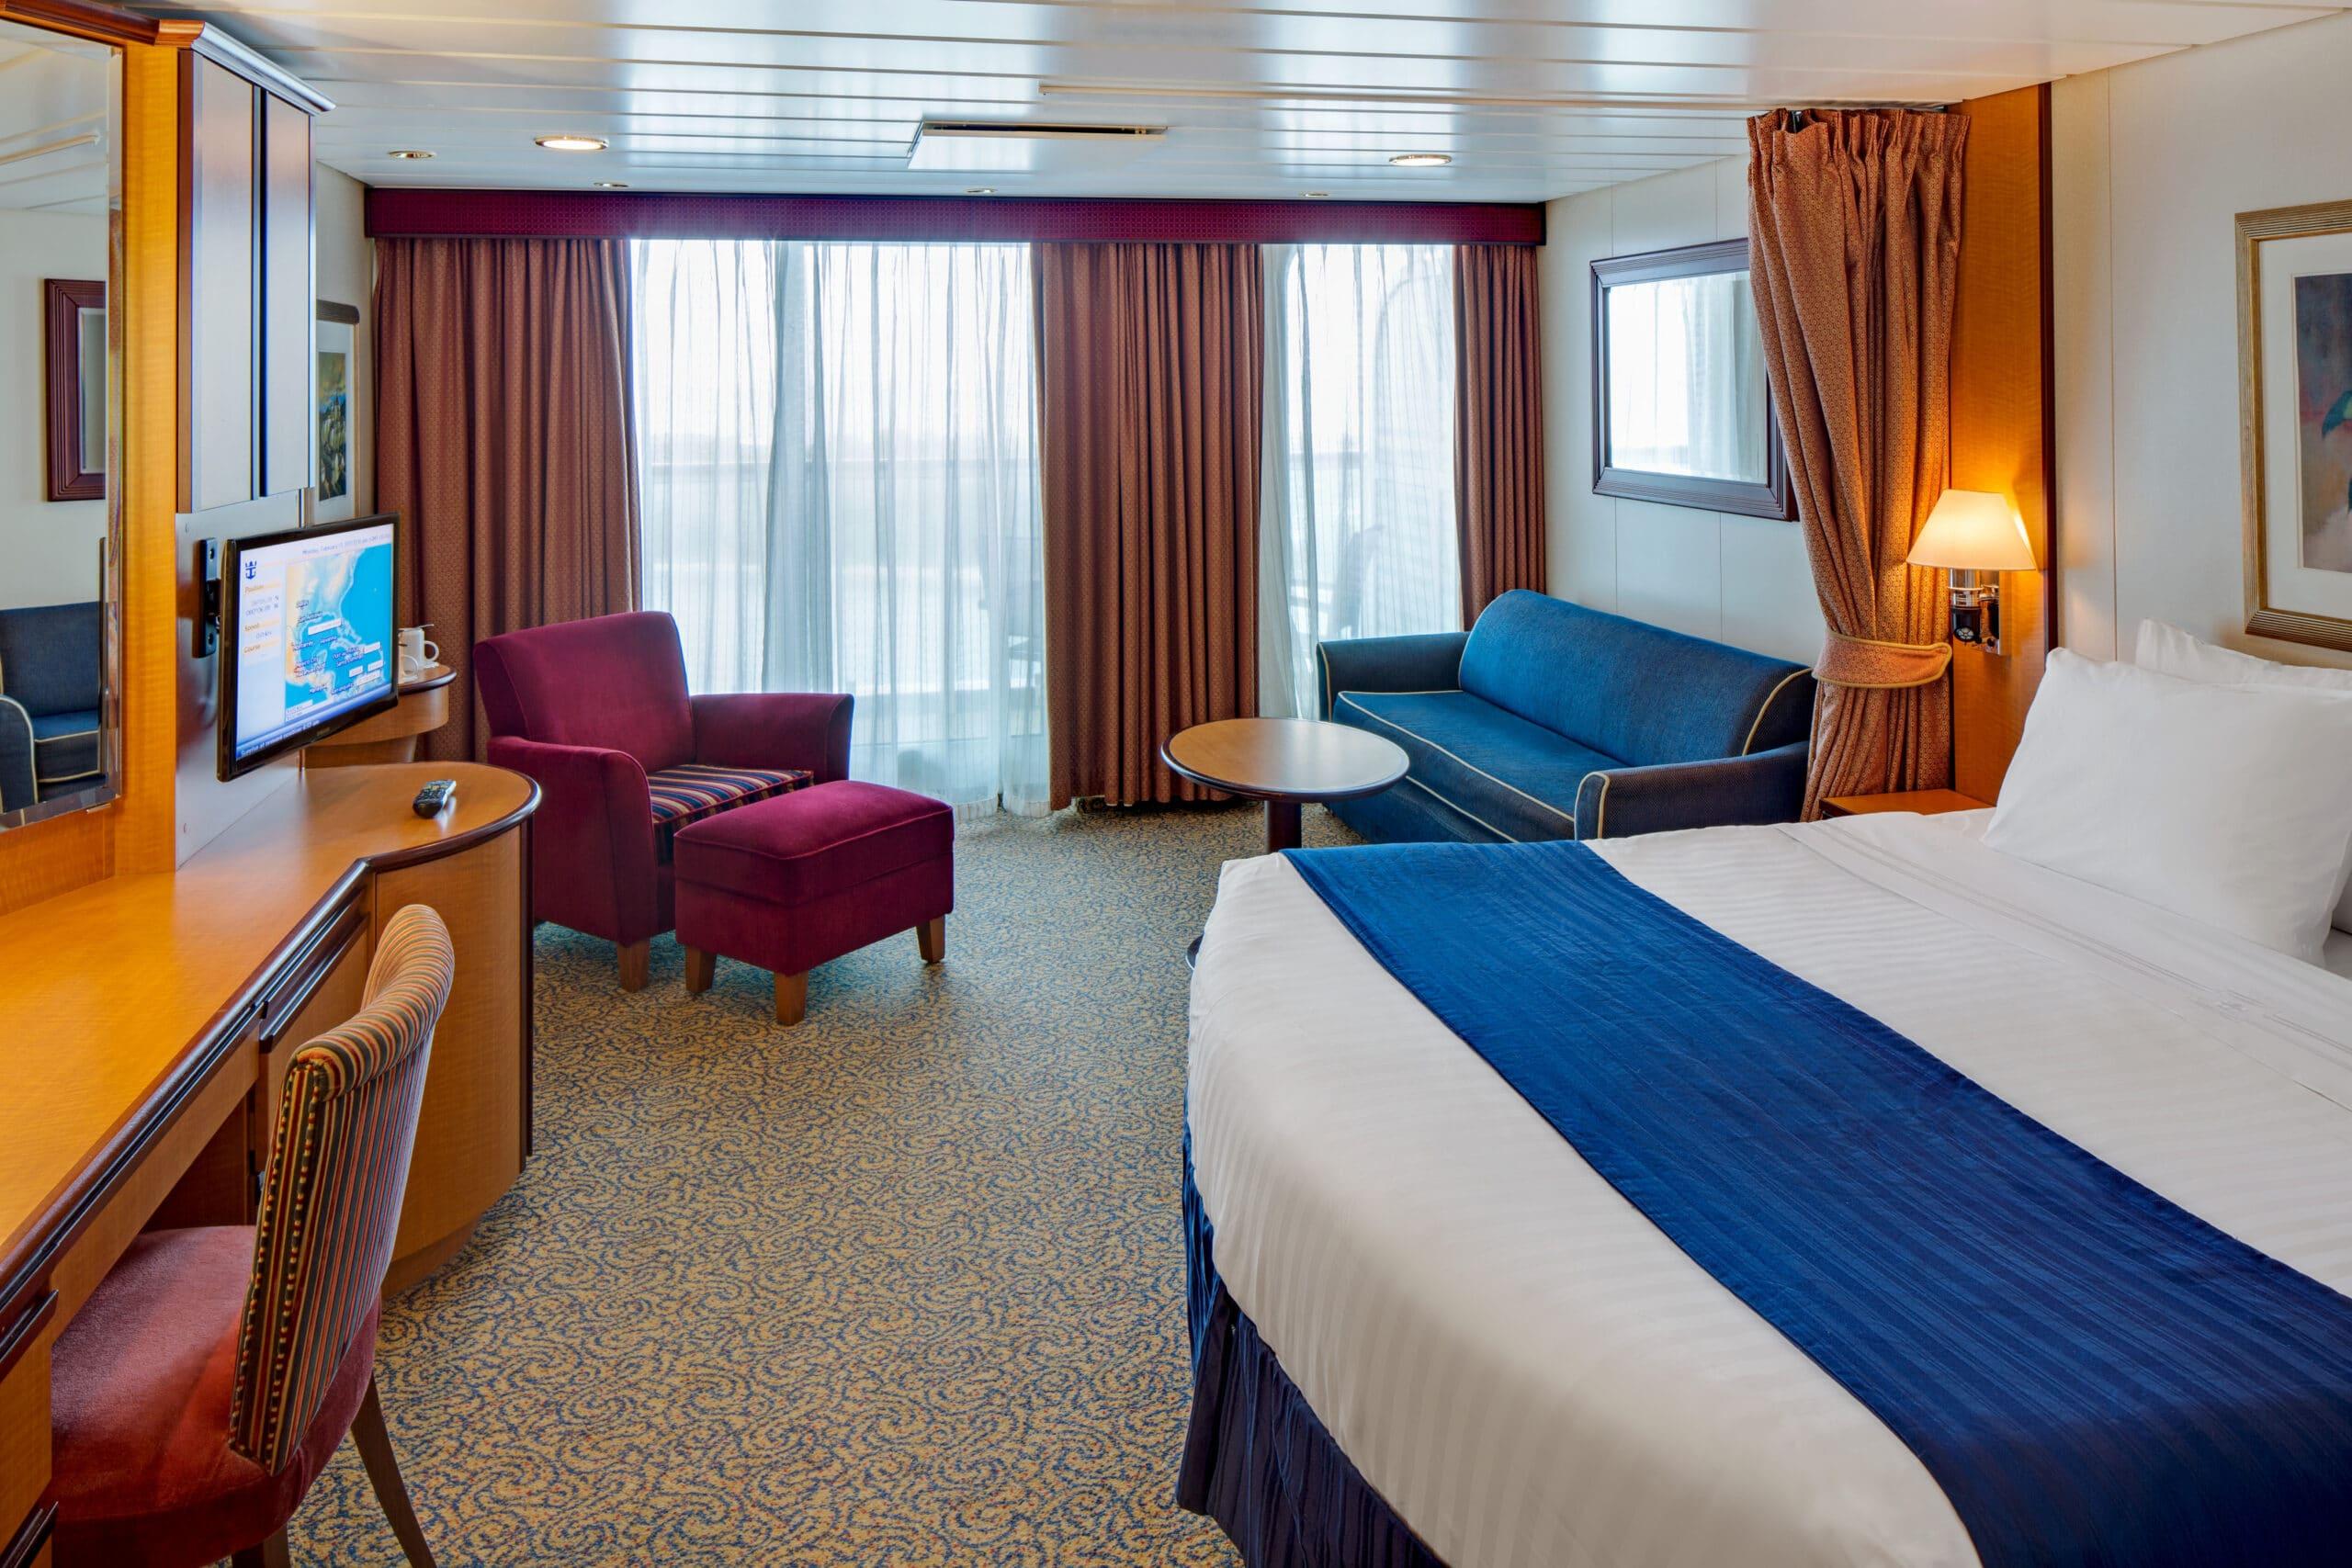 Royal-Caribbean-International-Serenade-of-the-Seas-schip-cruiseschip-categorie-J3-junior-suite